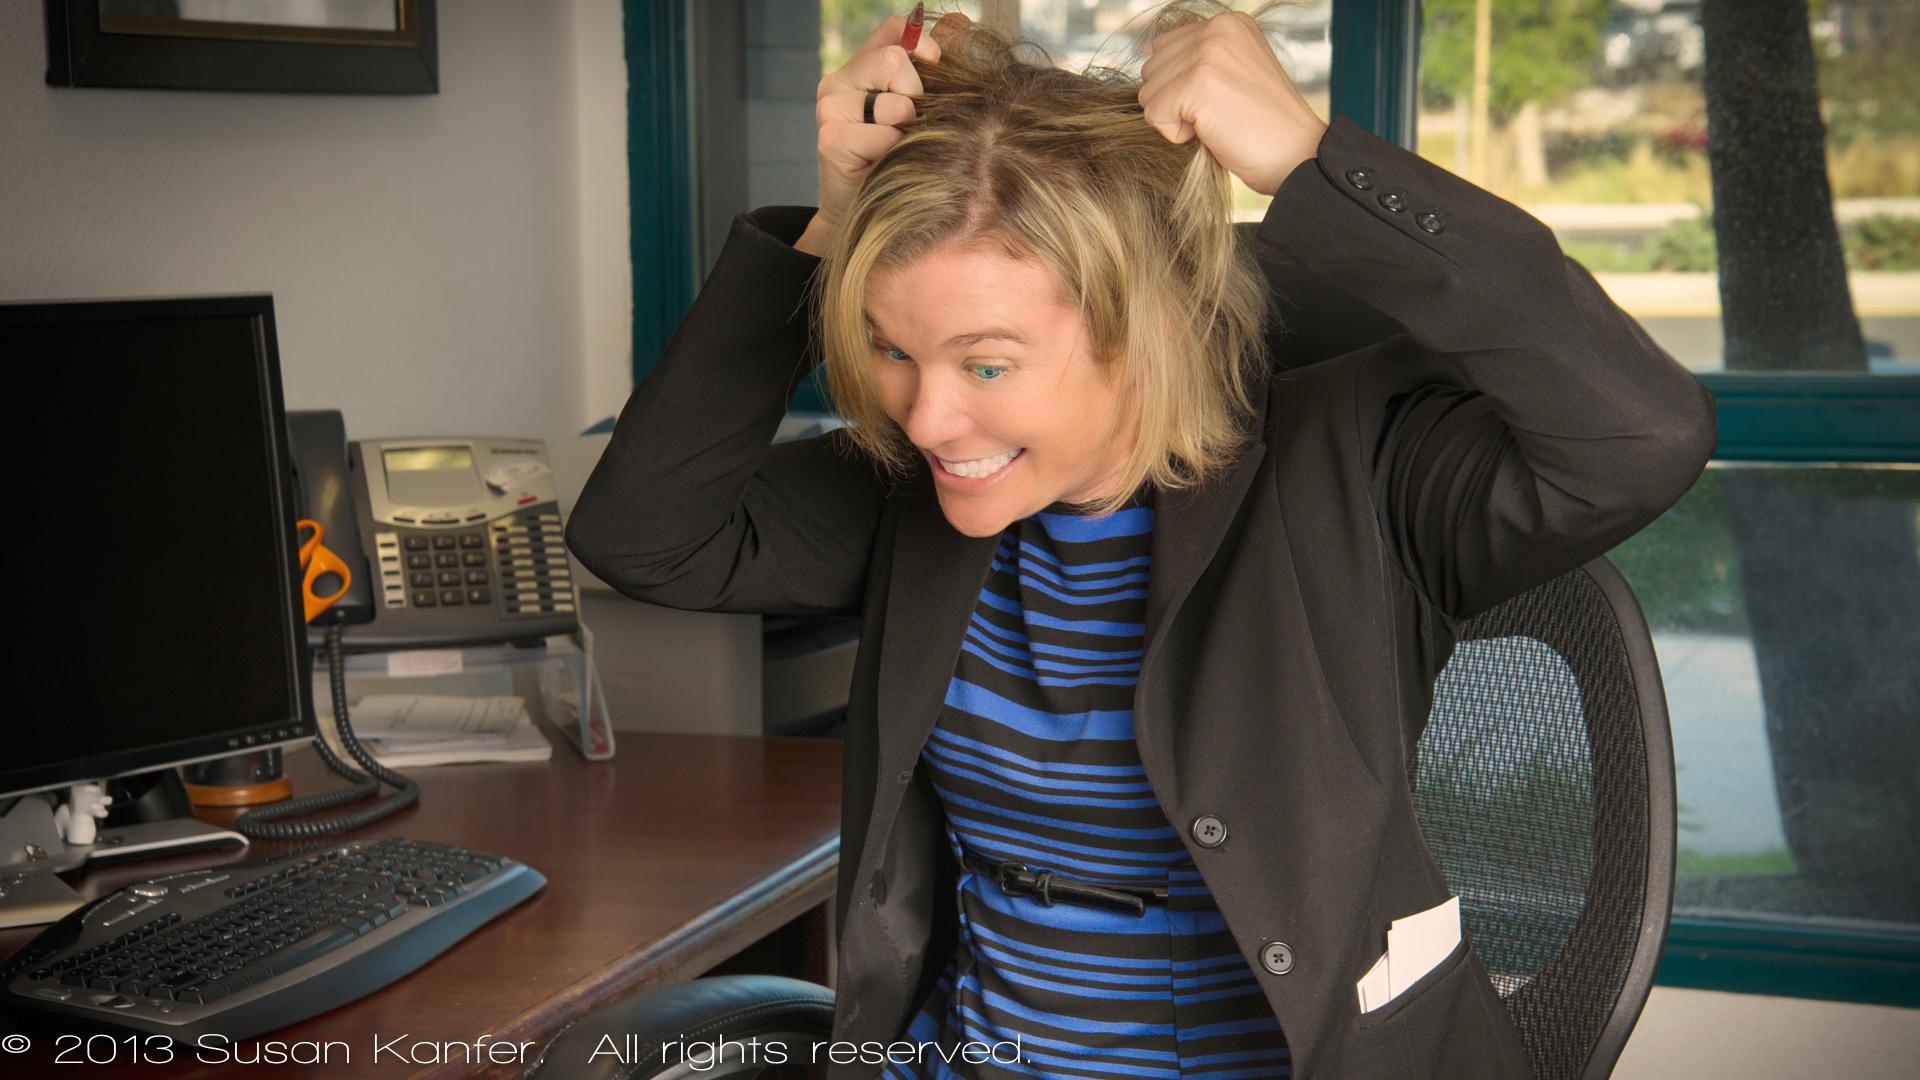 Businesswoman Pulls Her Hair